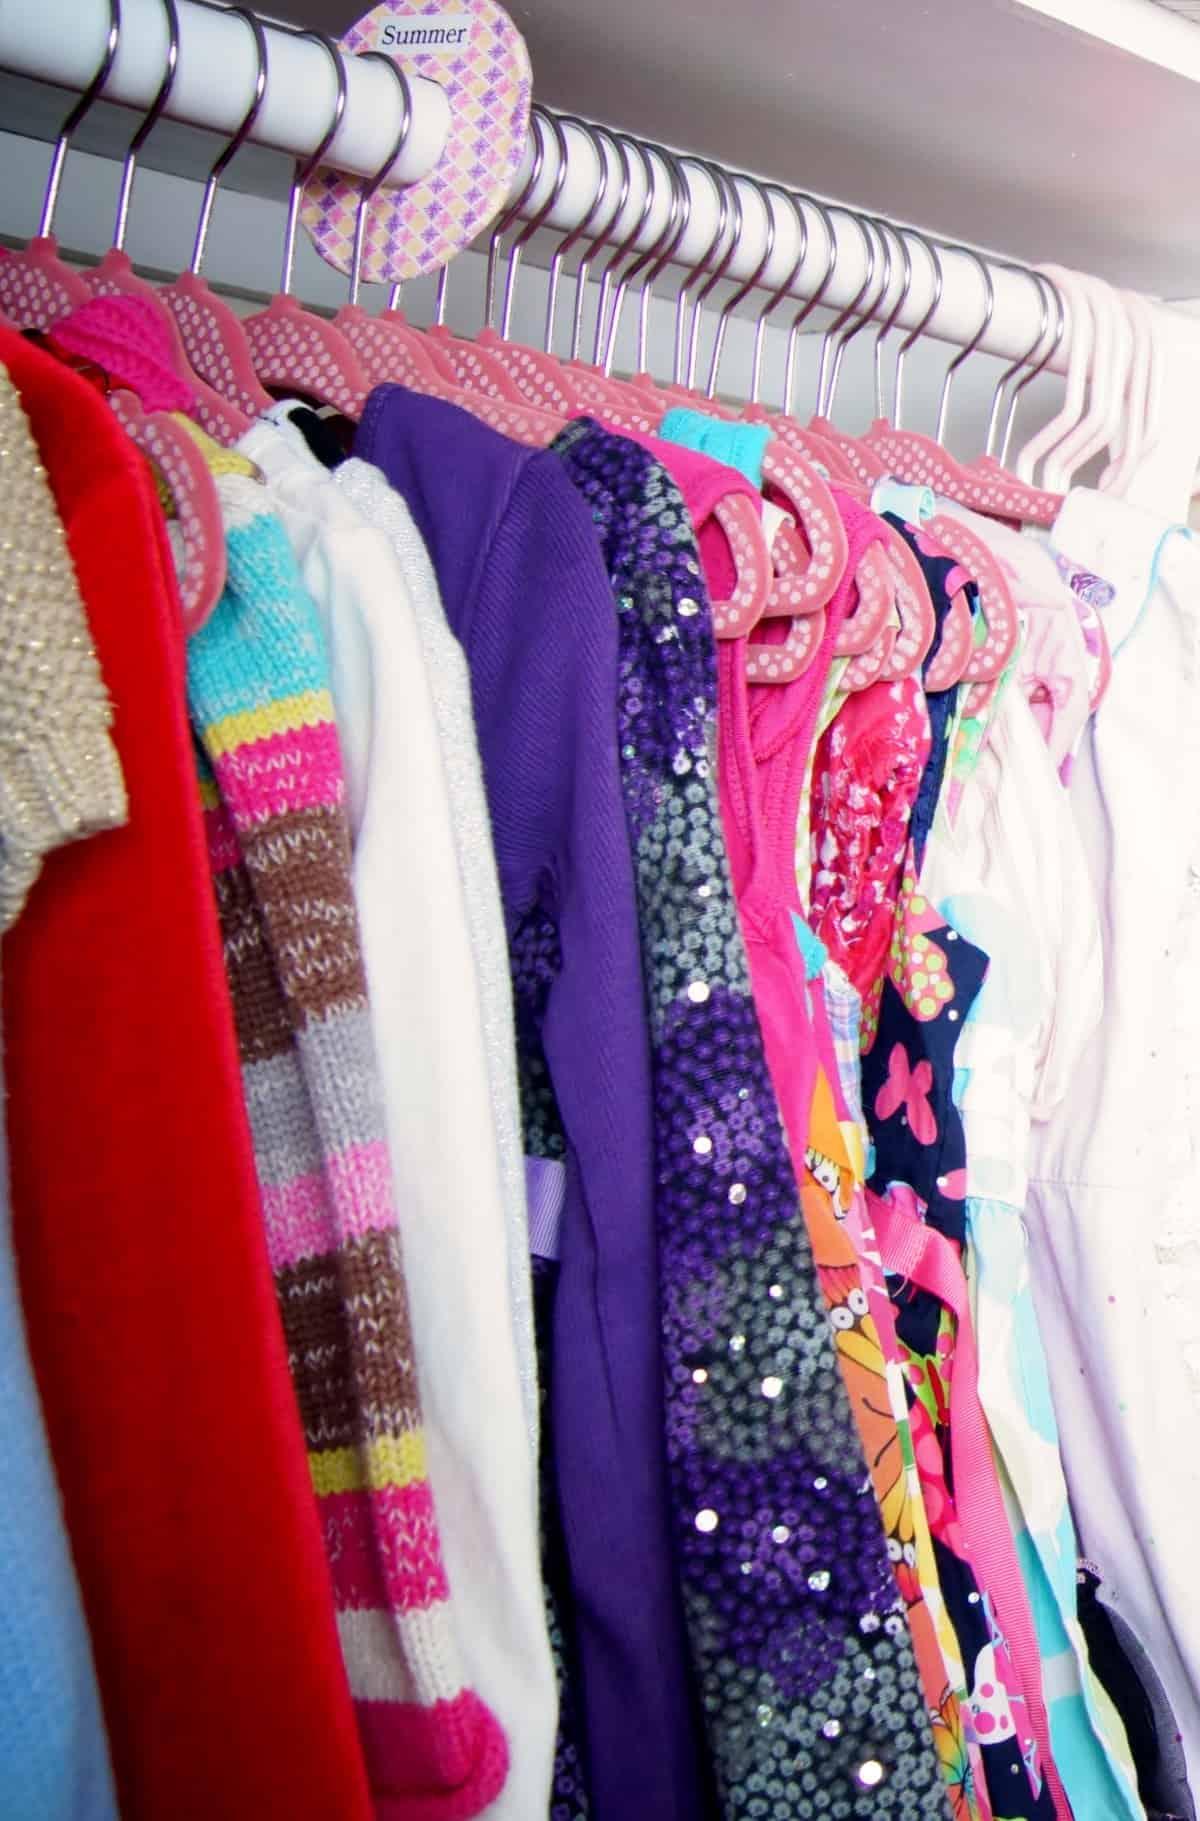 Organizing Closets How I Became A Hanger Snob And You